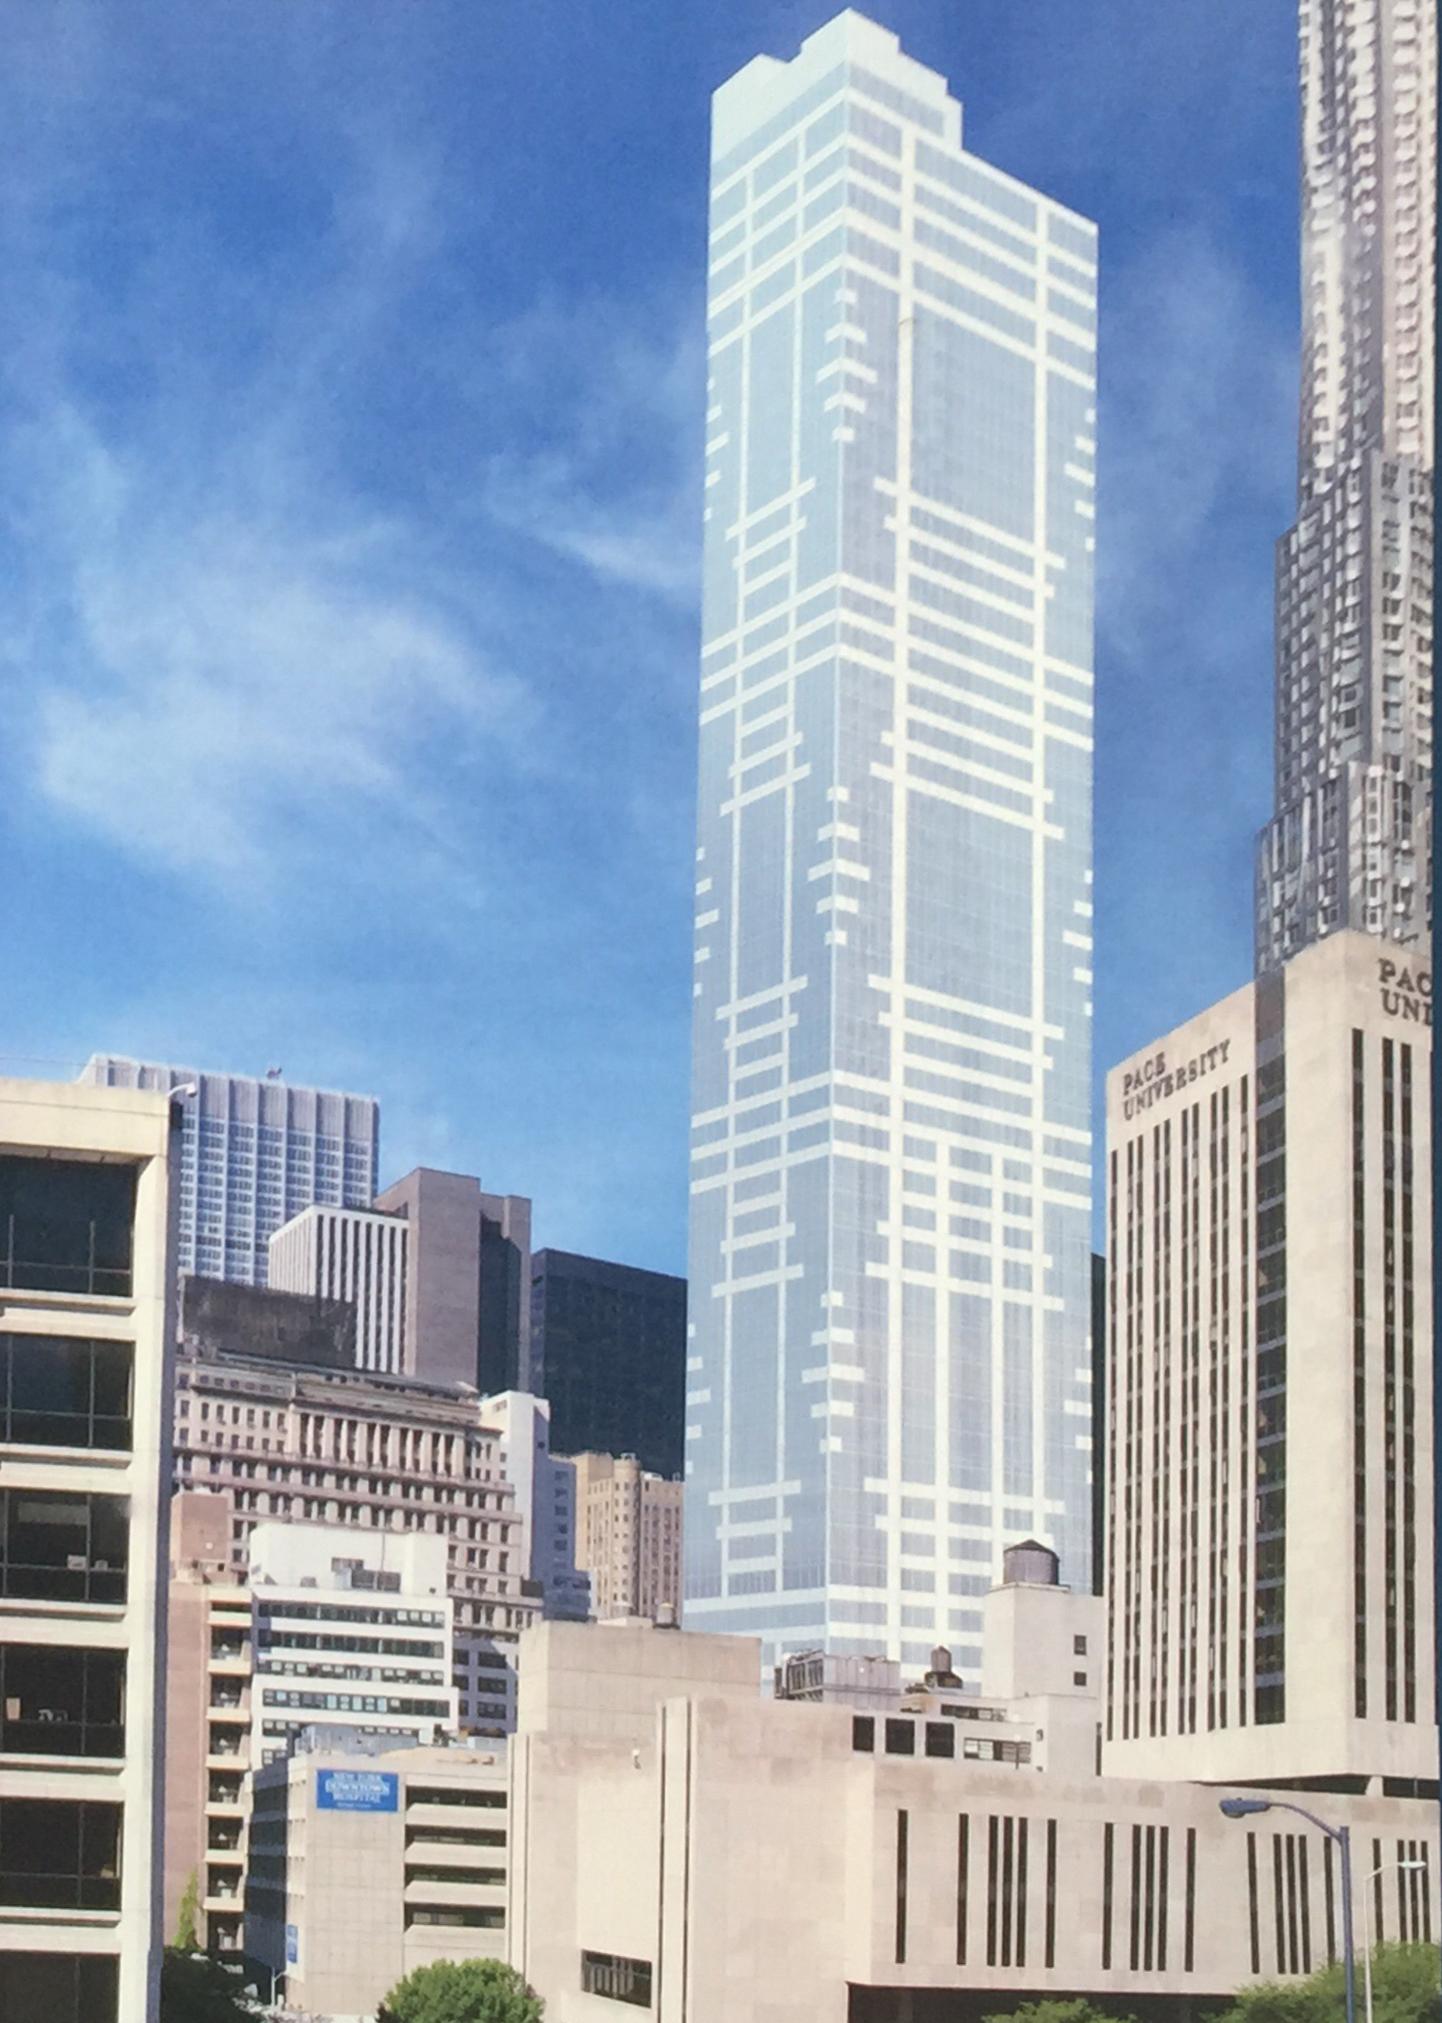 On-site rendering of 118 Fulton Street. Captured by Robert Walpole